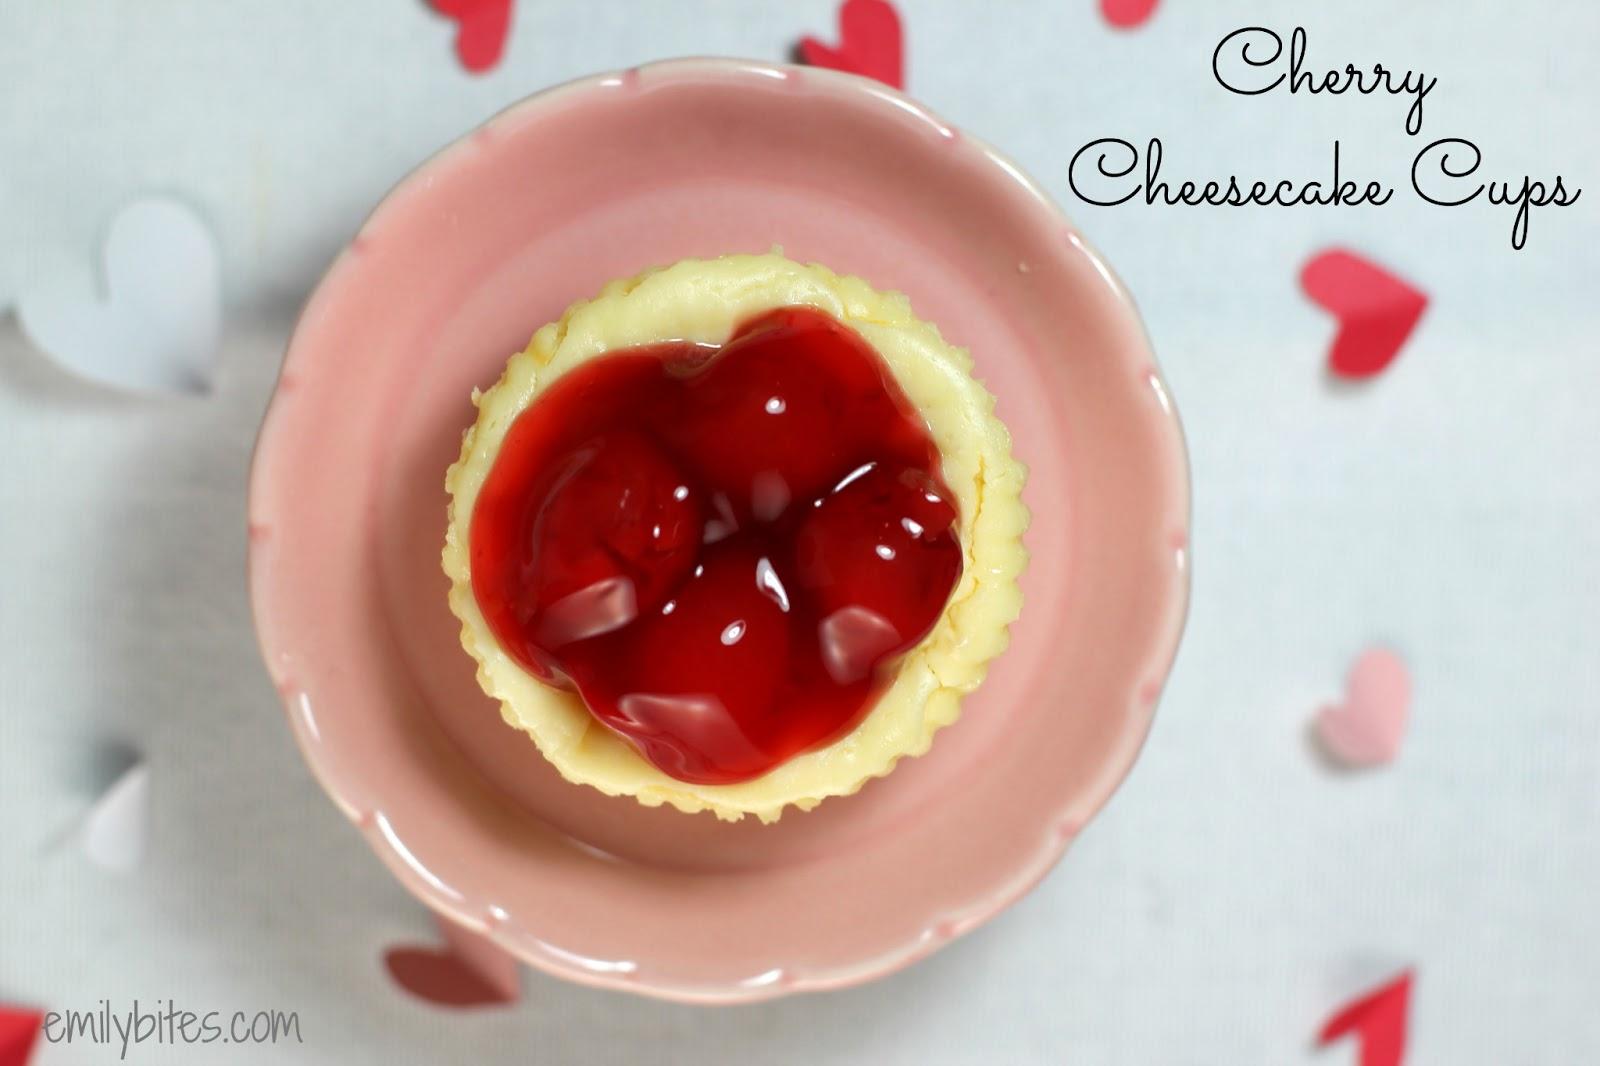 Cherry Cheesecake Cups | Pinnutty.com